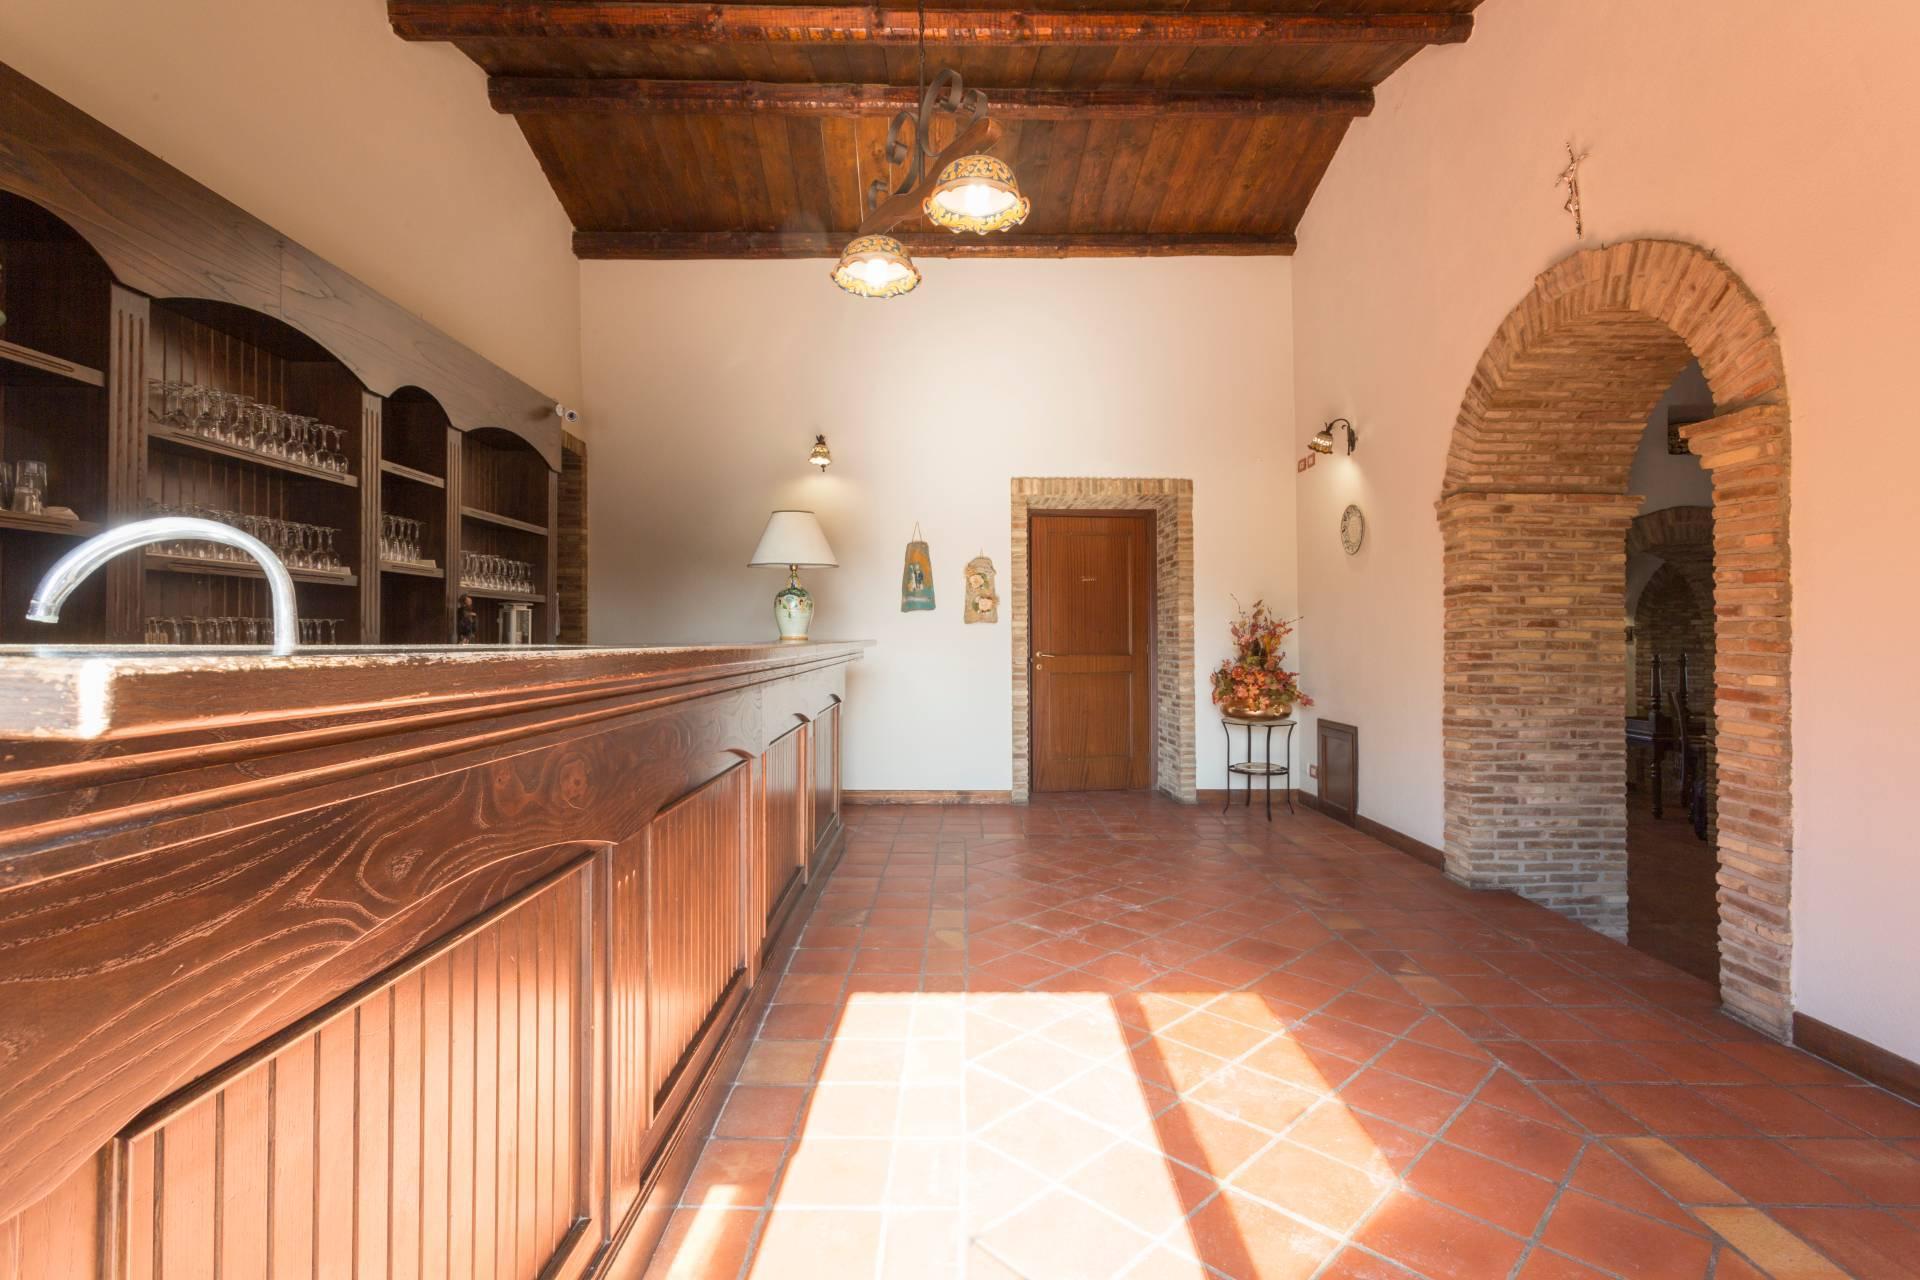 Villa in Vendita a Piazza Armerina: 5 locali, 550 mq - Foto 27